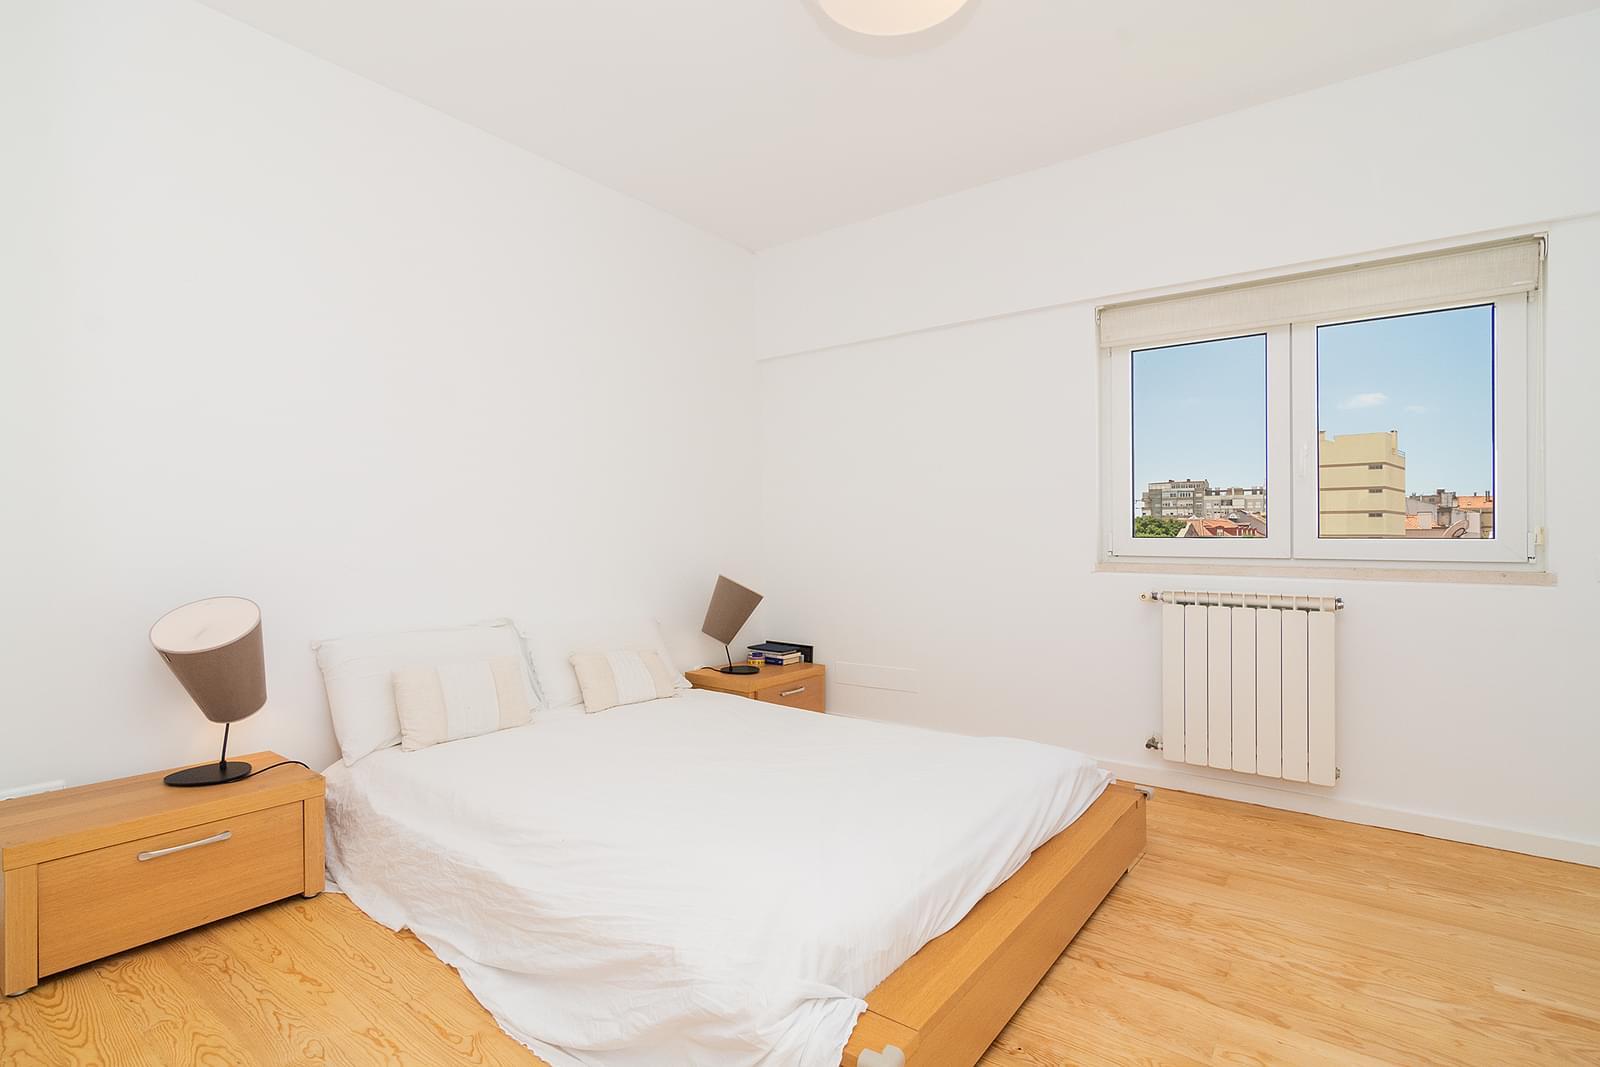 pf14147-apartamento-t3-lisboa-e57f370b-eee8-45f8-a08f-0f2205c645bd